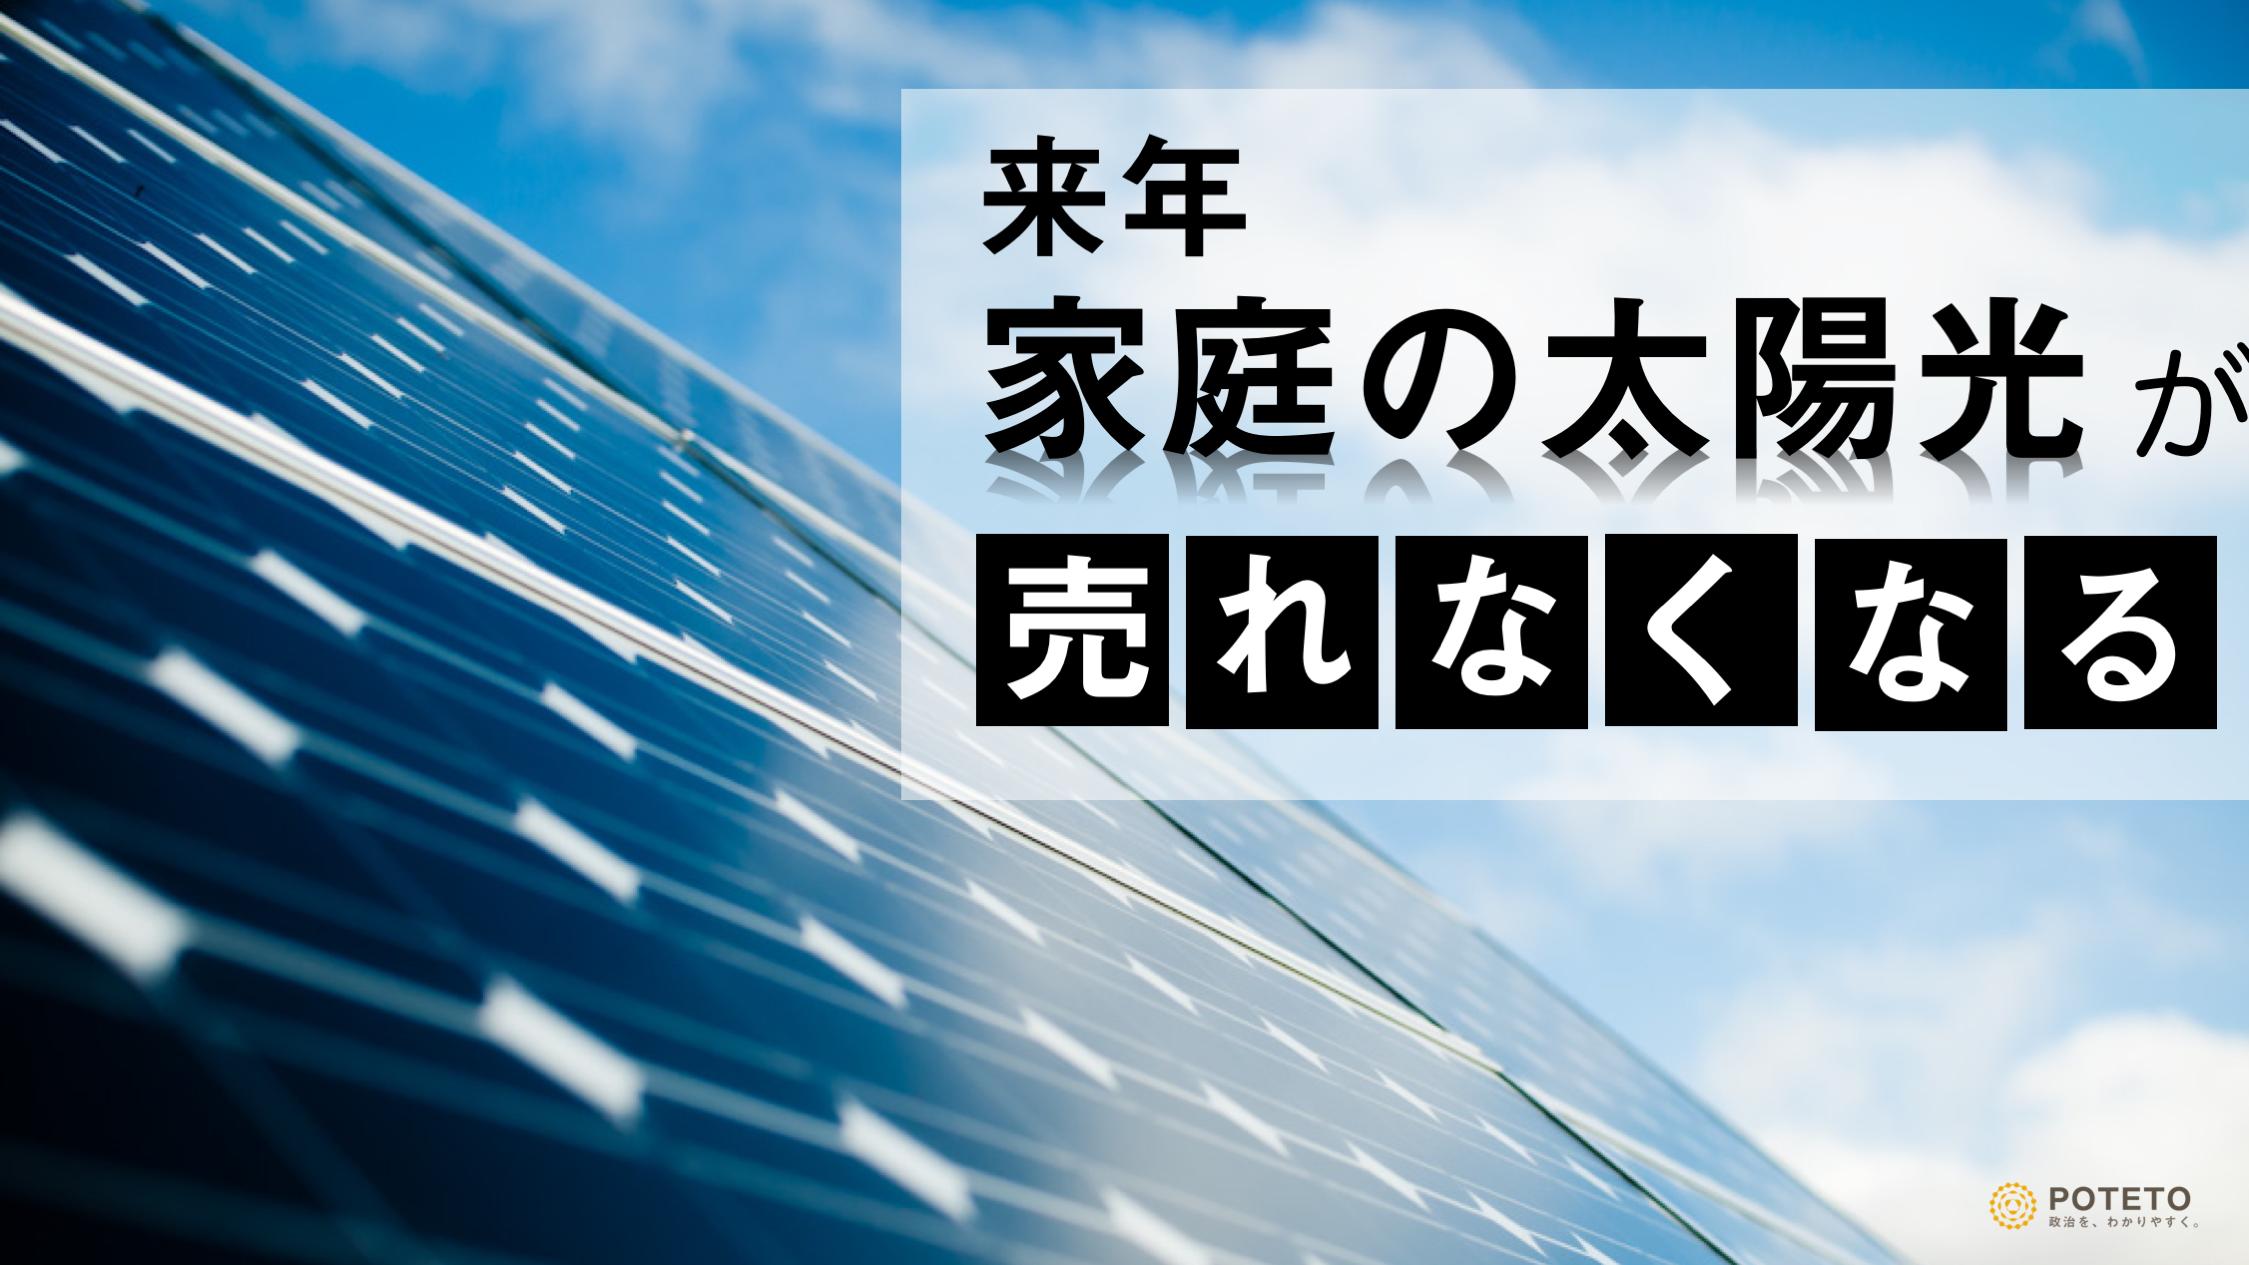 5621deba8a18b839c7a4321764bb05e8 3 - 【特集】来年から、太陽光パネルが売れなくなる?